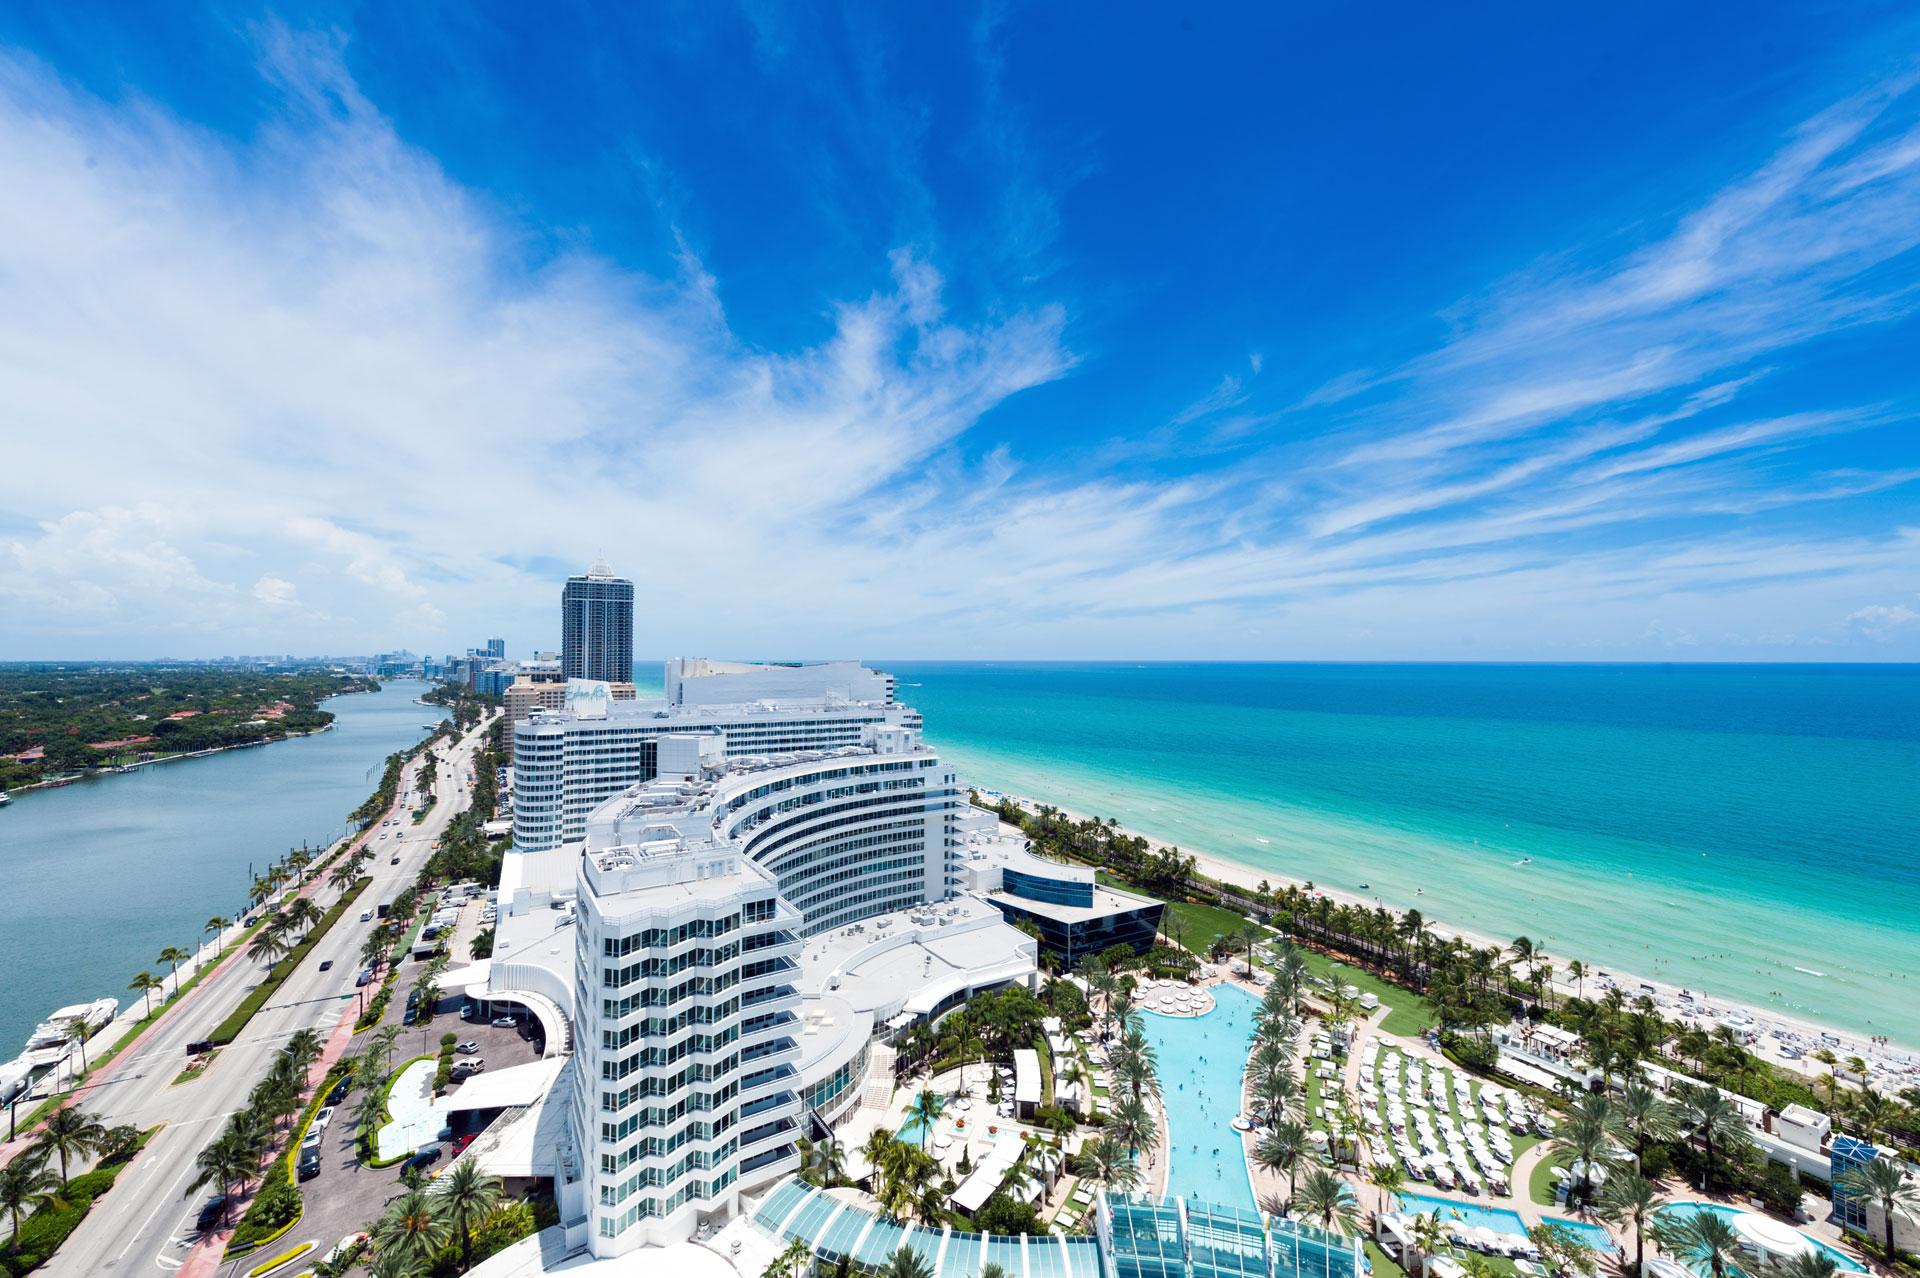 Miami Beach, rive droite. Photo Gérard Perez